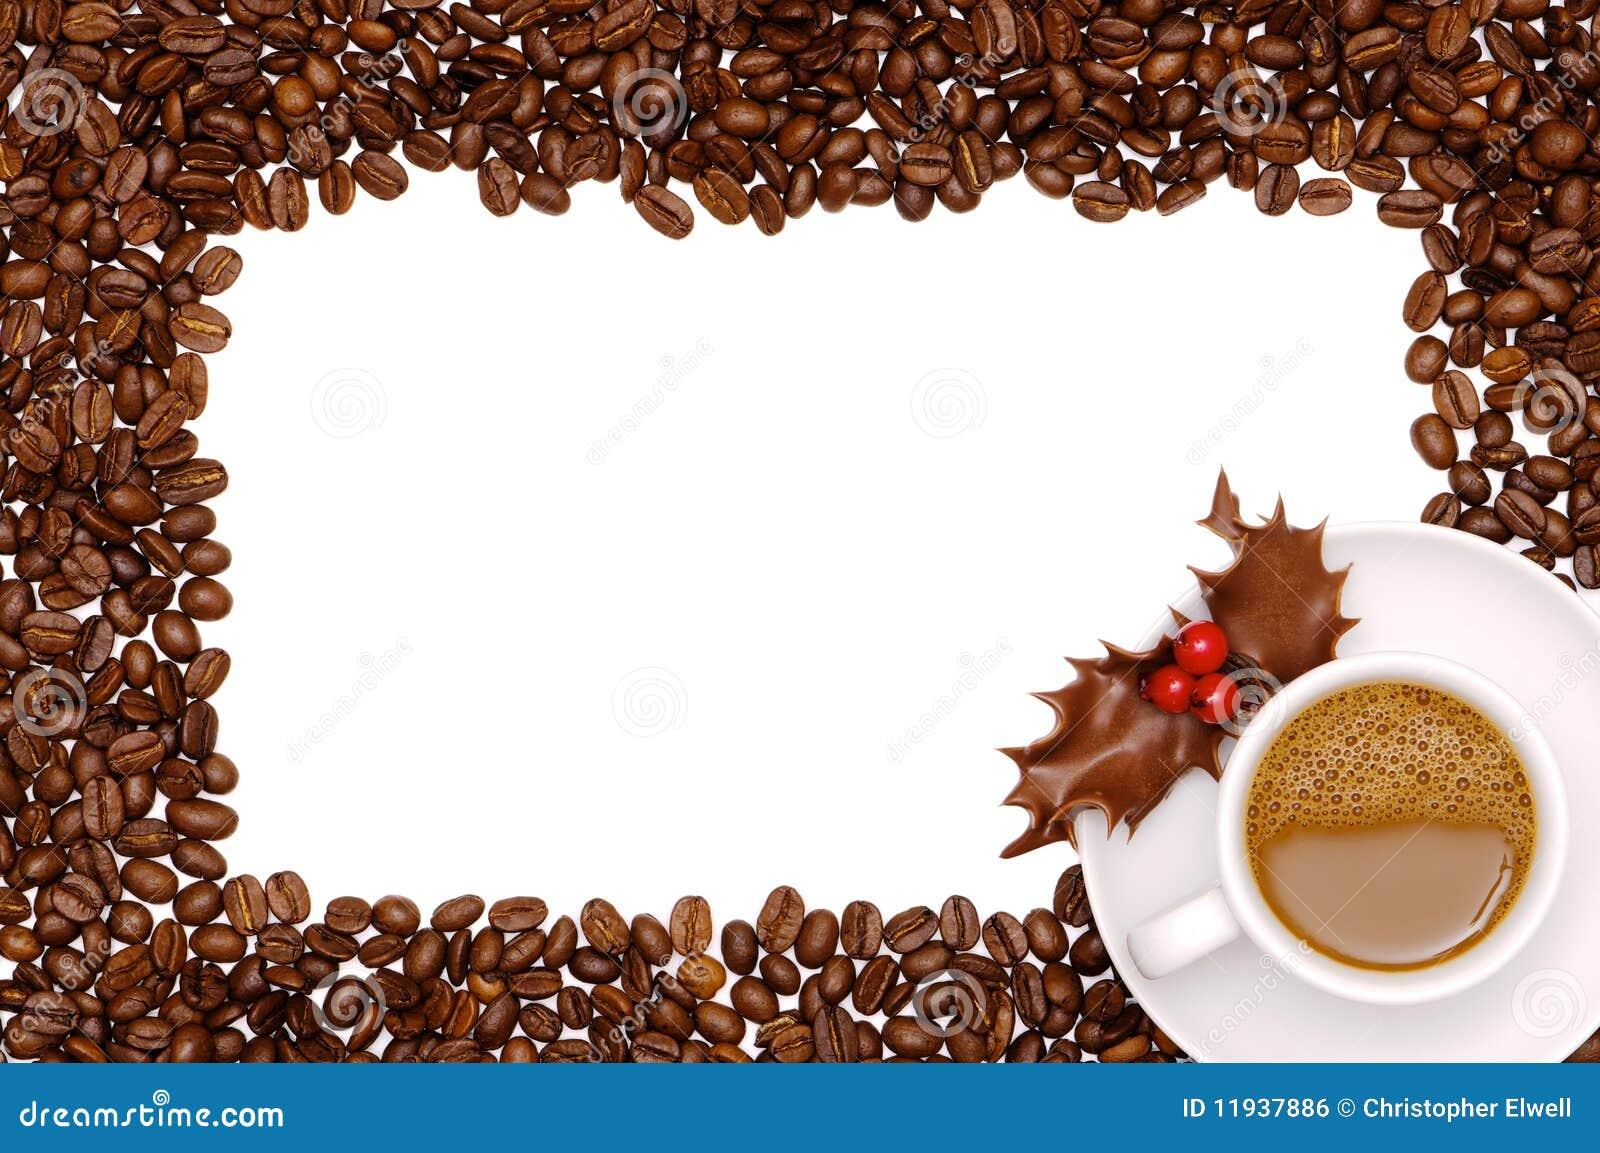 Festive Coffee Border Royalty Free Stock Image - Image ...